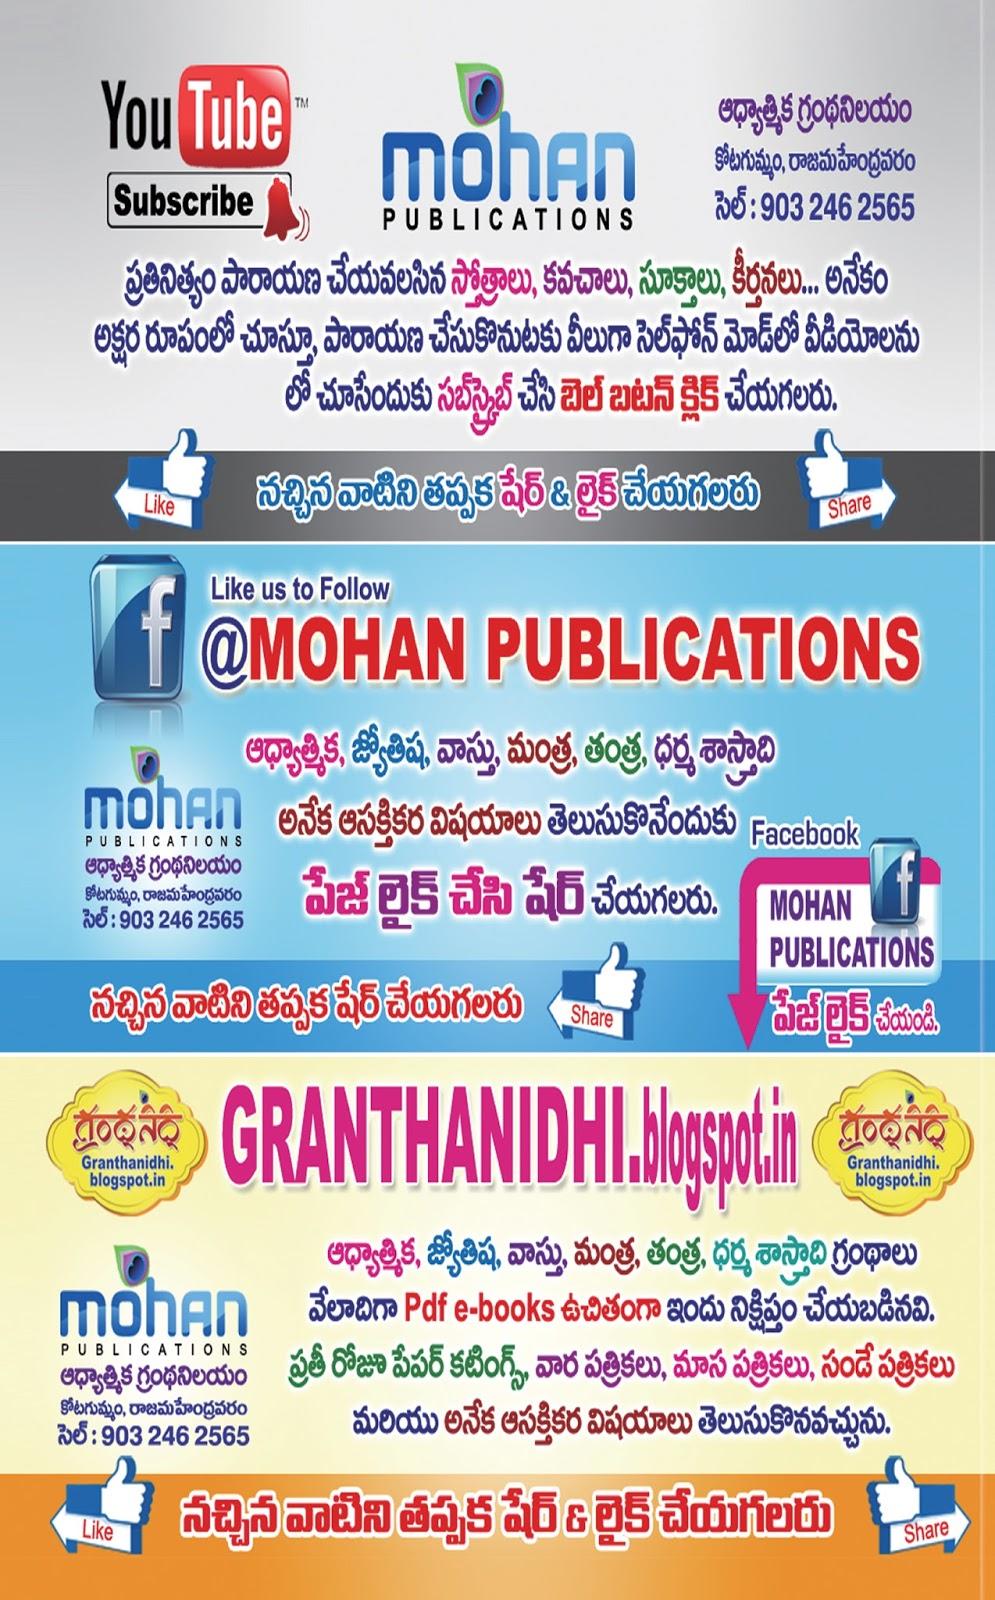 Bhakthi, Bhagavantudu. Dhyanam Meditation Mukthi Publications in Rajahmundry, Books Publisher in Rajahmundry, Popular Publisher in Rajahmundry, BhaktiPustakalu, Makarandam, Bhakthi Pustakalu, JYOTHISA,VASTU,MANTRA, TANTRA,YANTRA,RASIPALITALU, BHAKTI,LEELA,BHAKTHI SONGS, BHAKTHI,LAGNA,PURANA,NOMULU, VRATHAMULU,POOJALU,  KALABHAIRAVAGURU, SAHASRANAMAMULU,KAVACHAMULU, ASHTORAPUJA,KALASAPUJALU, KUJA DOSHA,DASAMAHAVIDYA, SADHANALU,MOHAN PUBLICATIONS, RAJAHMUNDRY BOOK STORE, BOOKS,DEVOTIONAL BOOKS, KALABHAIRAVA GURU,KALABHAIRAVA, RAJAMAHENDRAVARAM,GODAVARI,GOWTHAMI, FORTGATE,KOTAGUMMAM,GODAVARI RAILWAY STATION, PRINT BOOKS,E BOOKS,PDF BOOKS, FREE PDF BOOKS,BHAKTHI MANDARAM,GRANTHANIDHI, GRANDANIDI,GRANDHANIDHI, BHAKTHI PUSTHAKALU, BHAKTI PUSTHAKALU, BHAKTHI